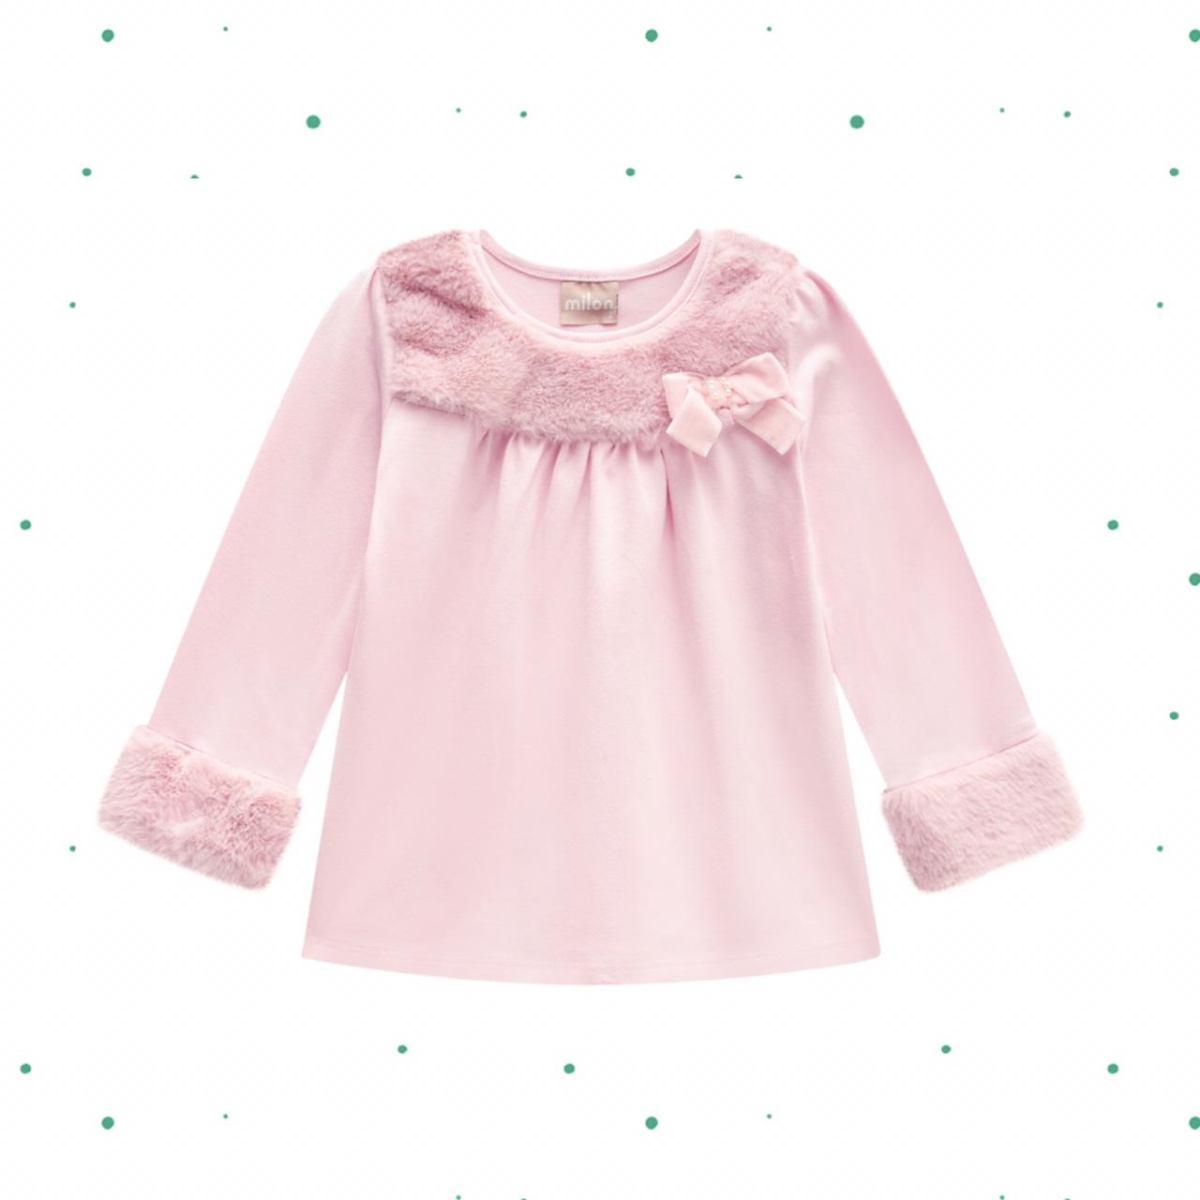 Blusa Menina Milon em Cotton